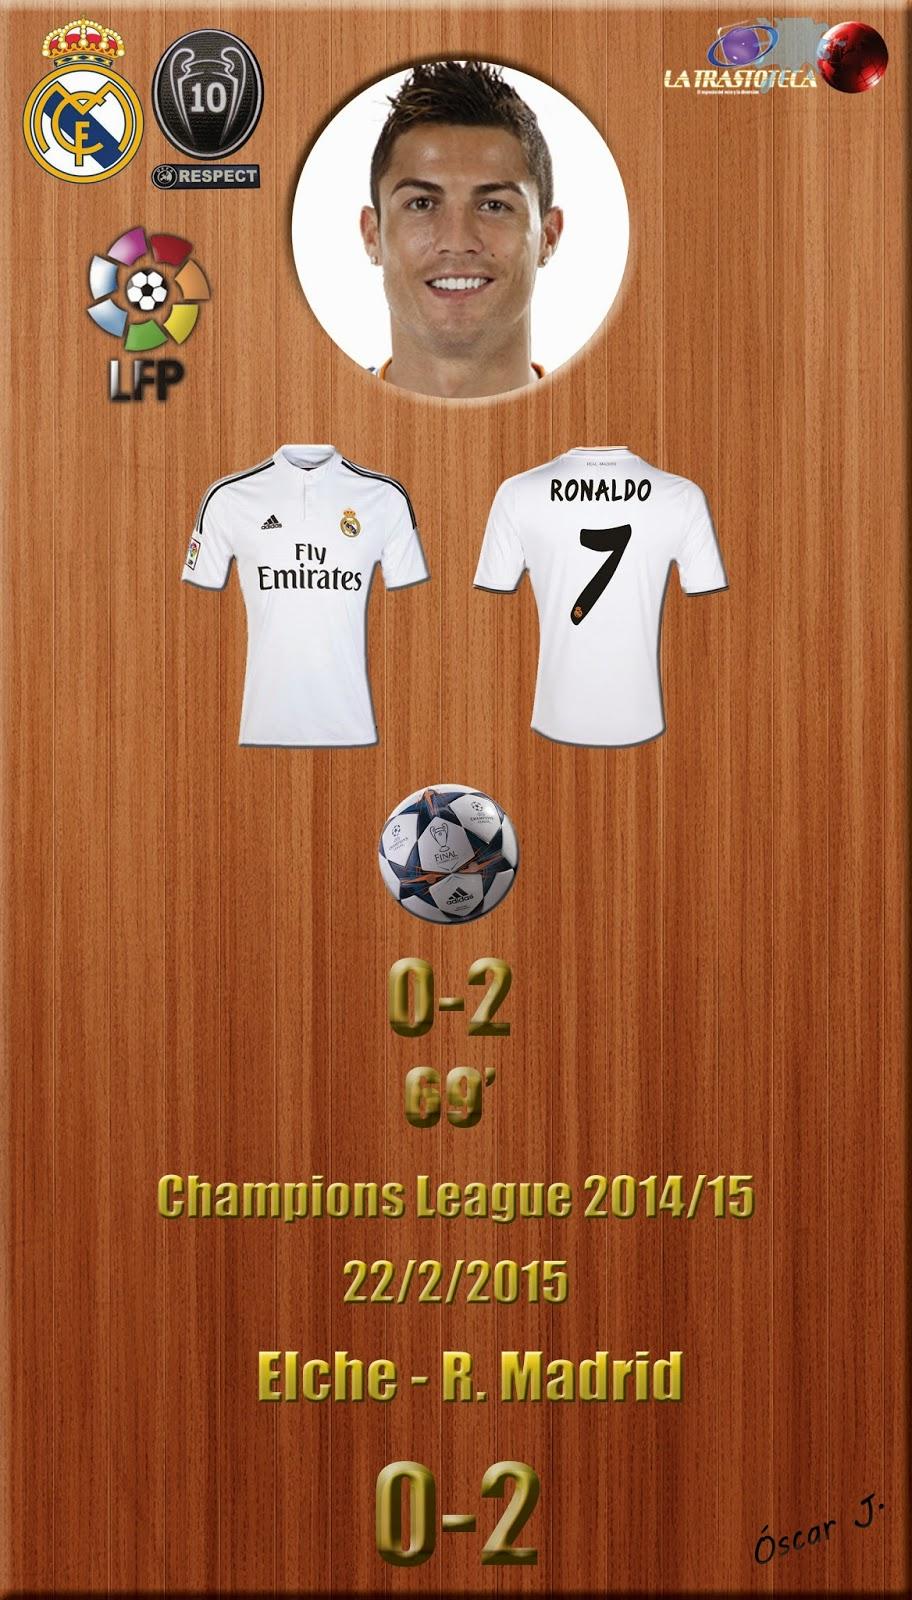 Cristiano Ronaldo (0-2) - Elche 0- 2 Real Madrid - Liga 2014/15 - Jornada 24 - (22/2/2015)